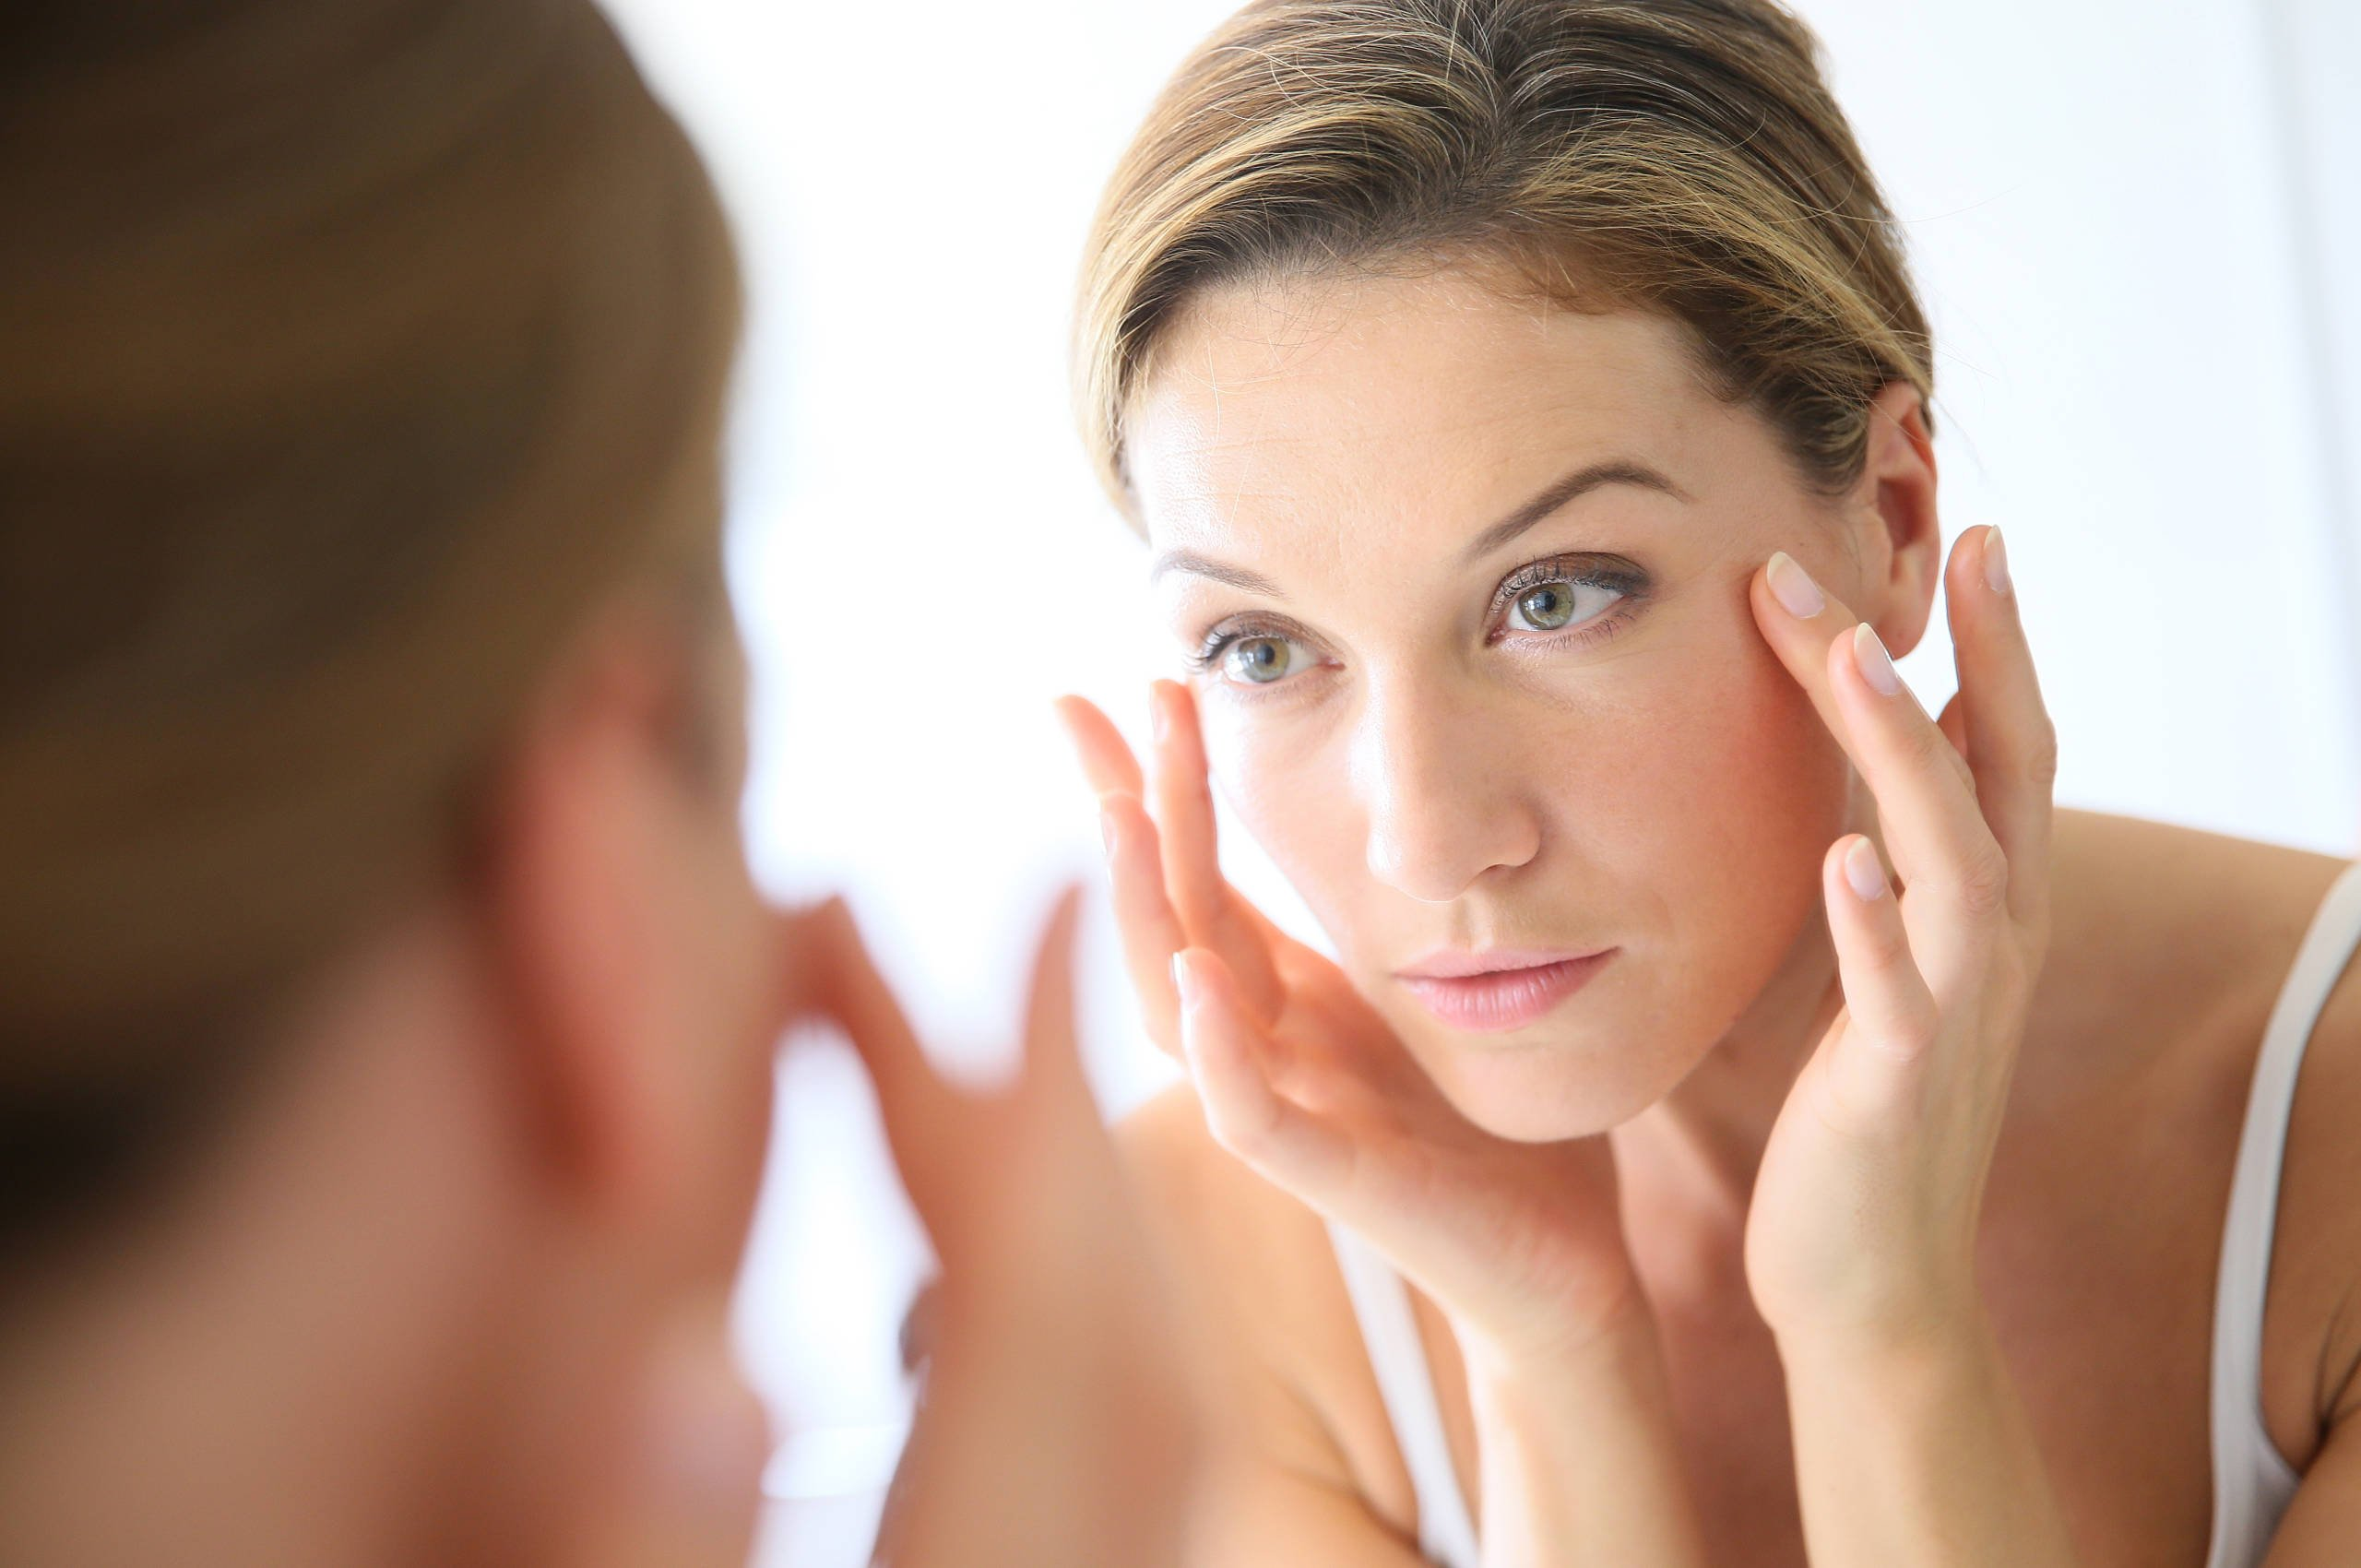 Eπιδερμίδα γύρω από τα μάτια: Αναδόμηση με 5 απλά tips